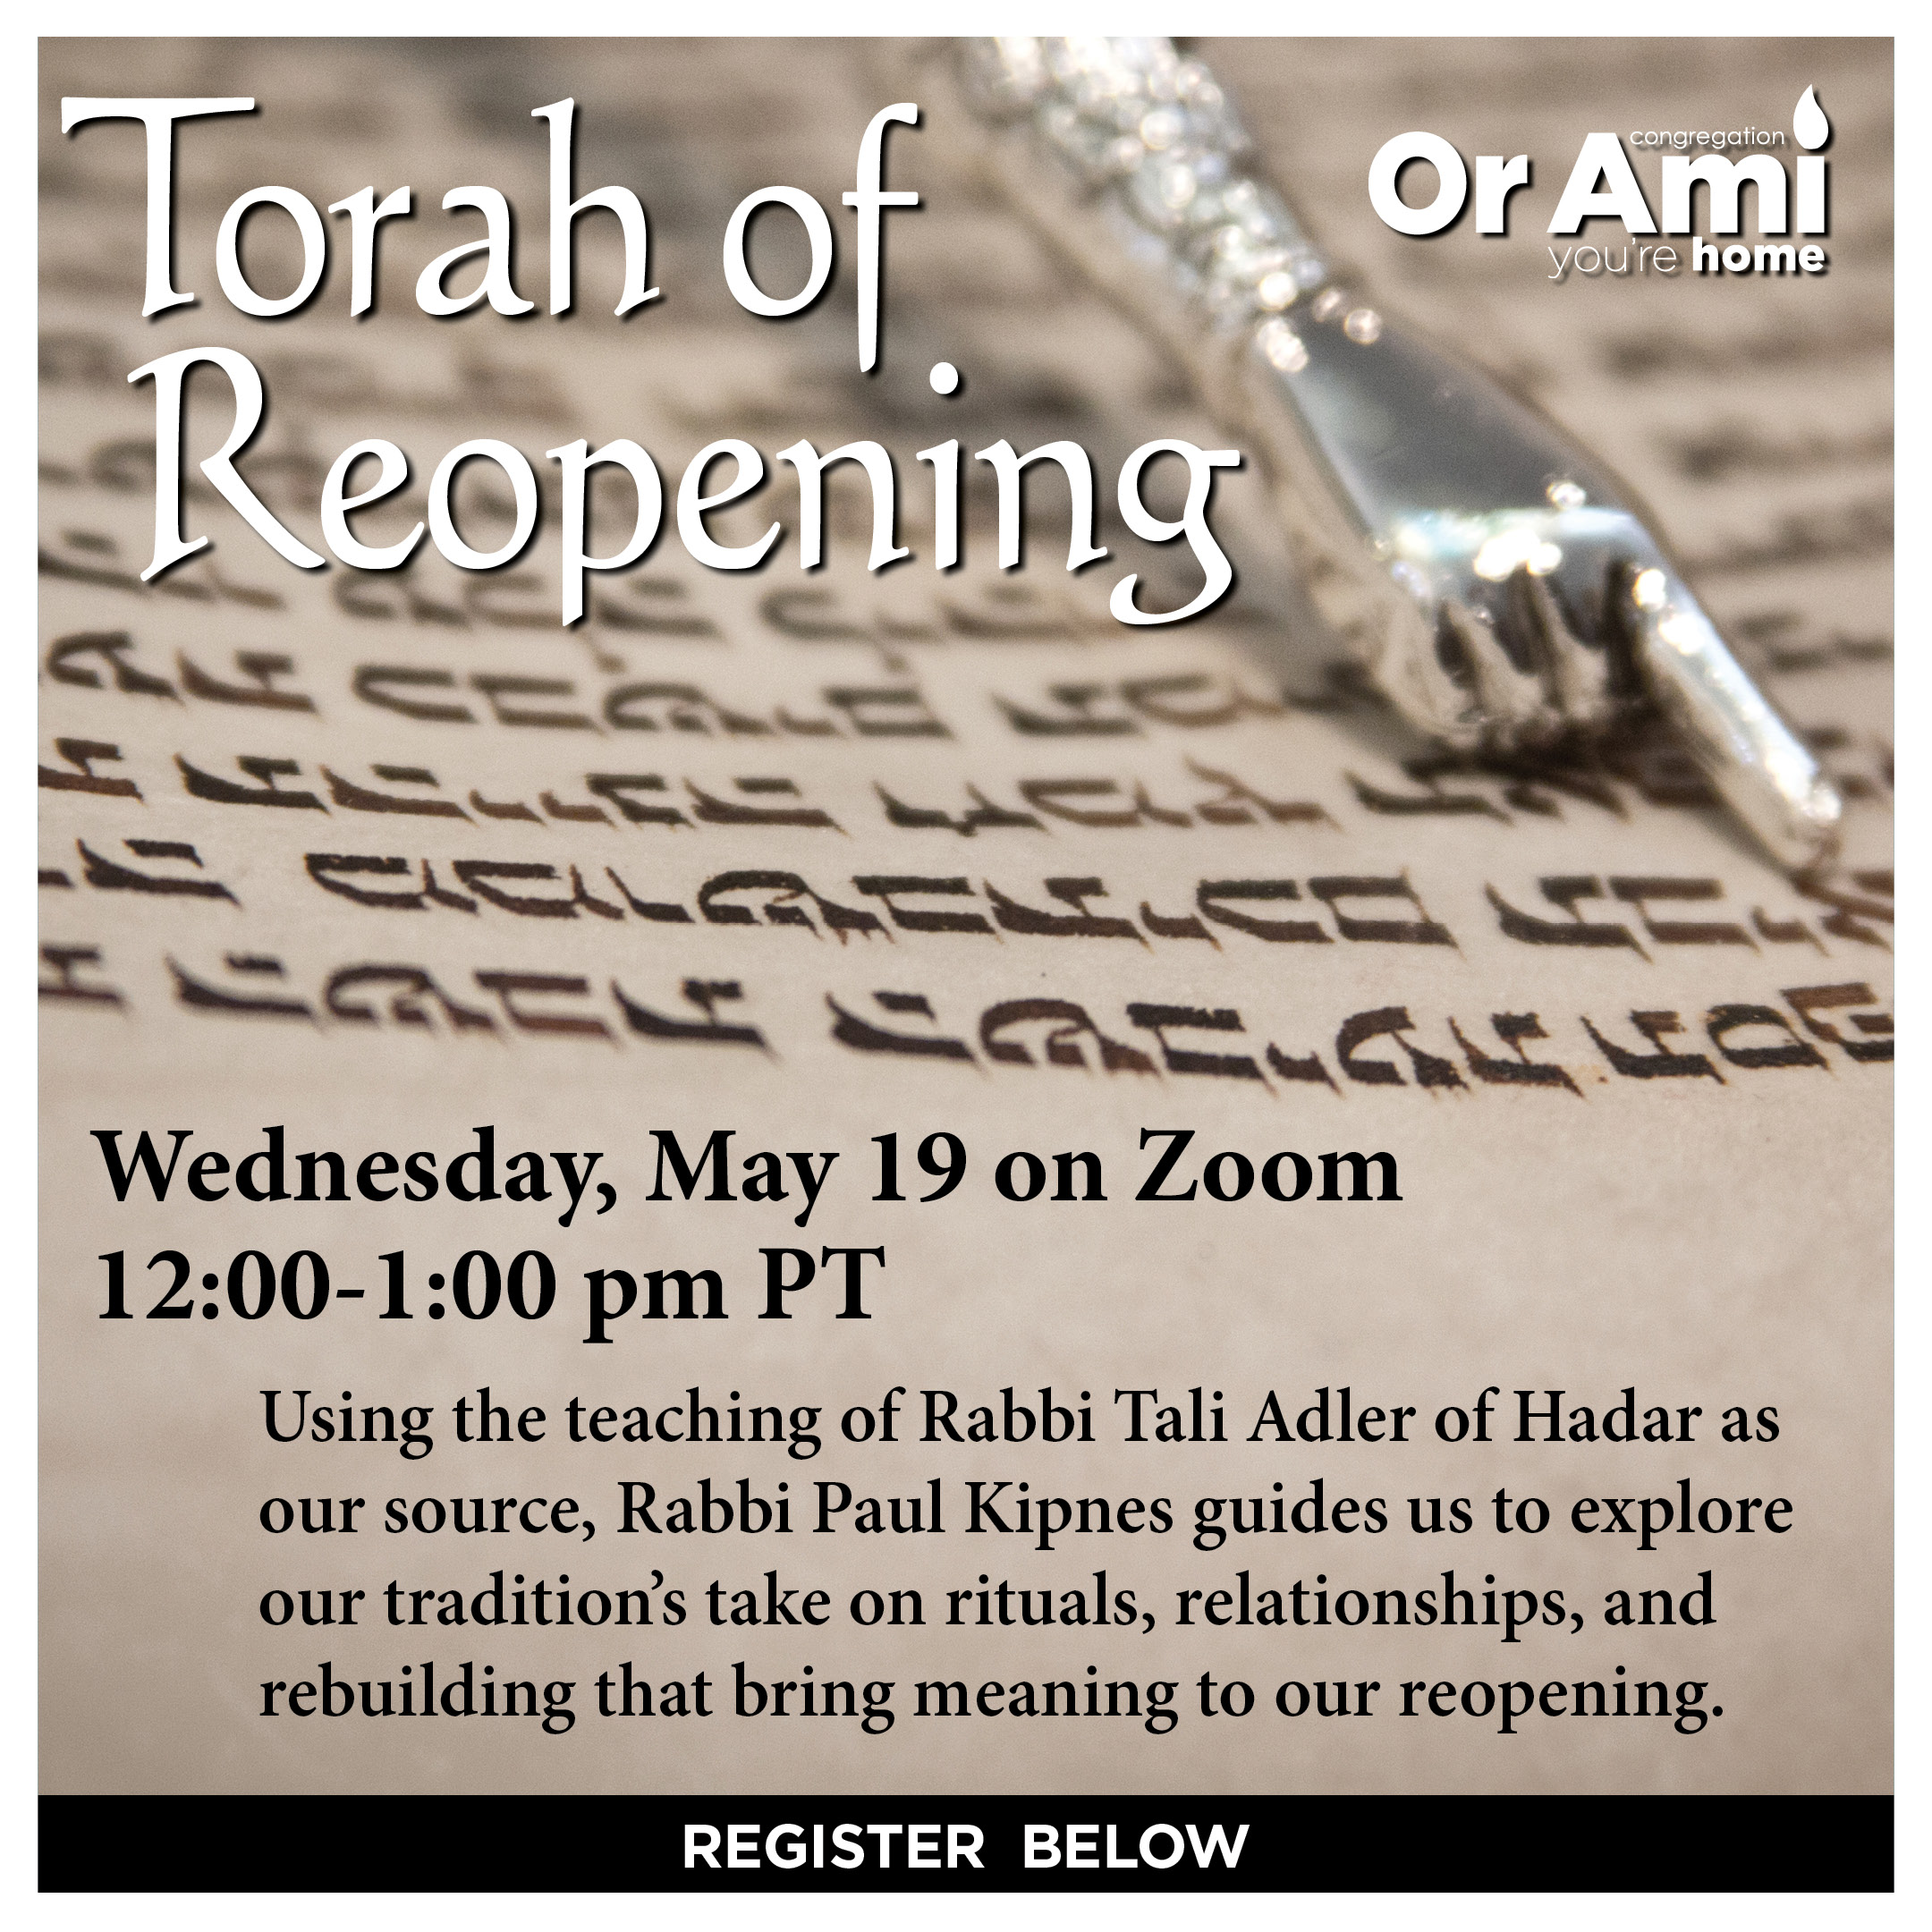 Or Ami Torah of Reopening SC 2021